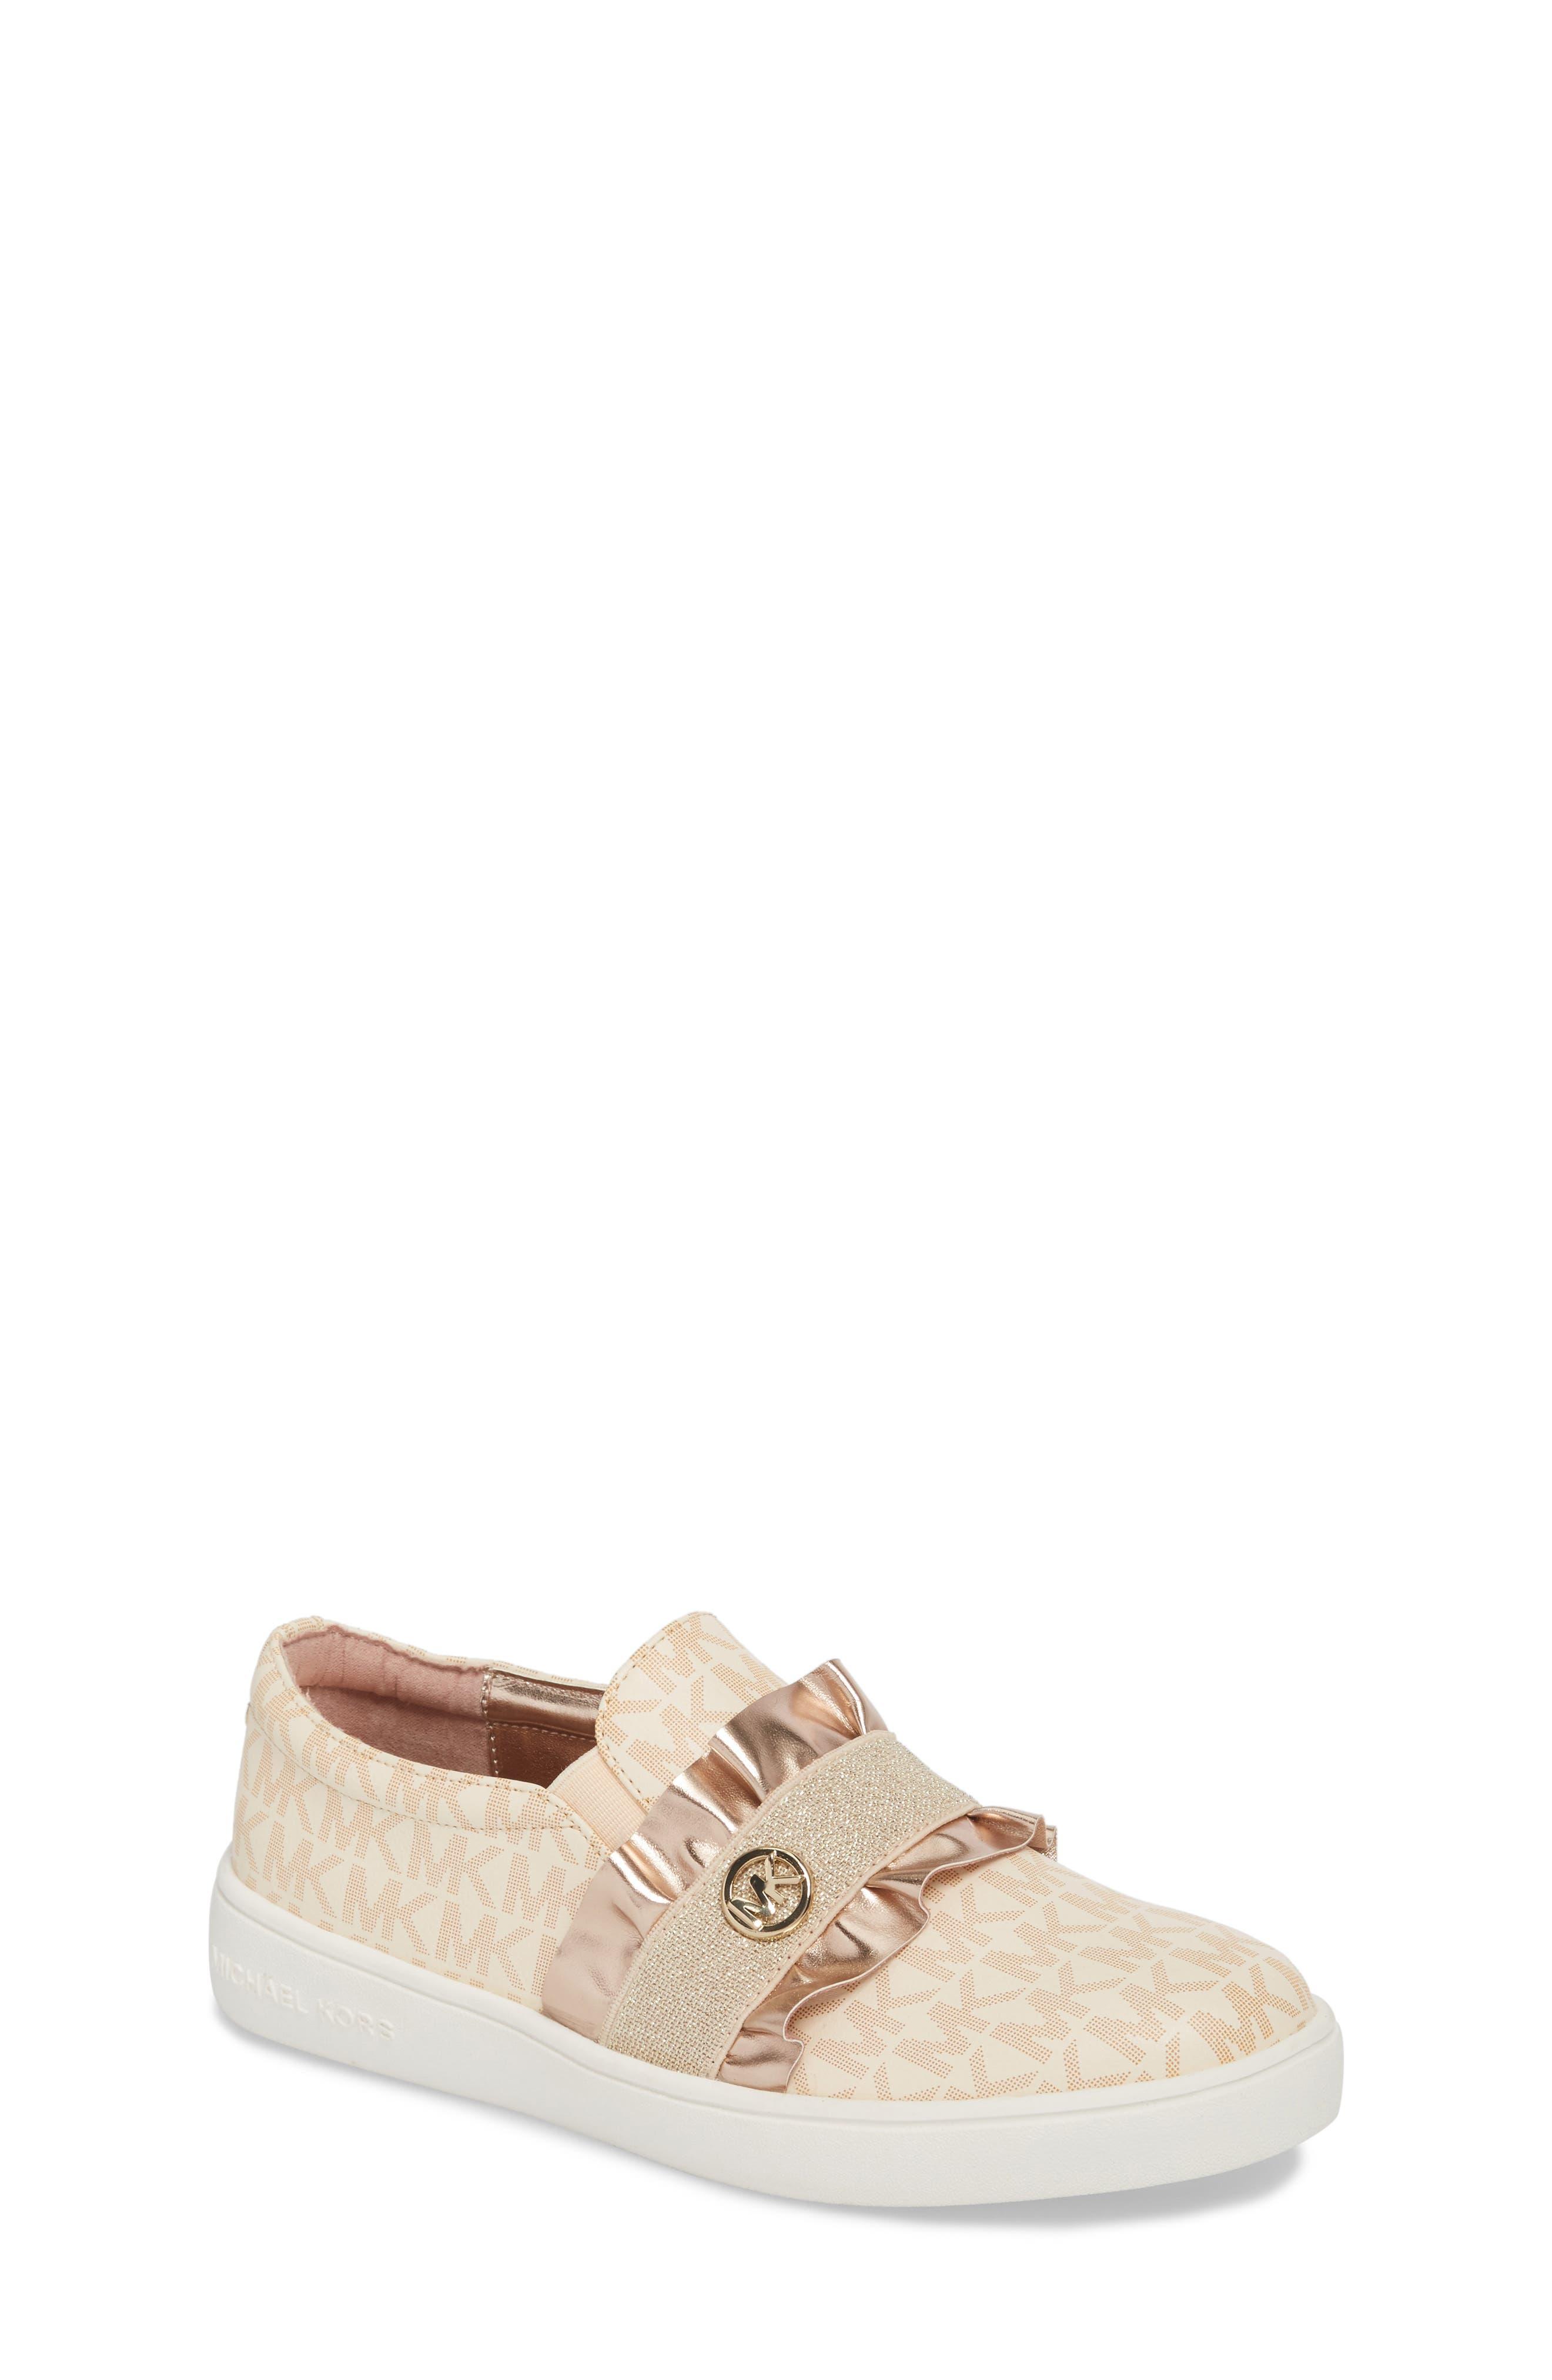 Ivy Riff Ruffle Sneaker,                             Main thumbnail 1, color,                             ROSE GOLD